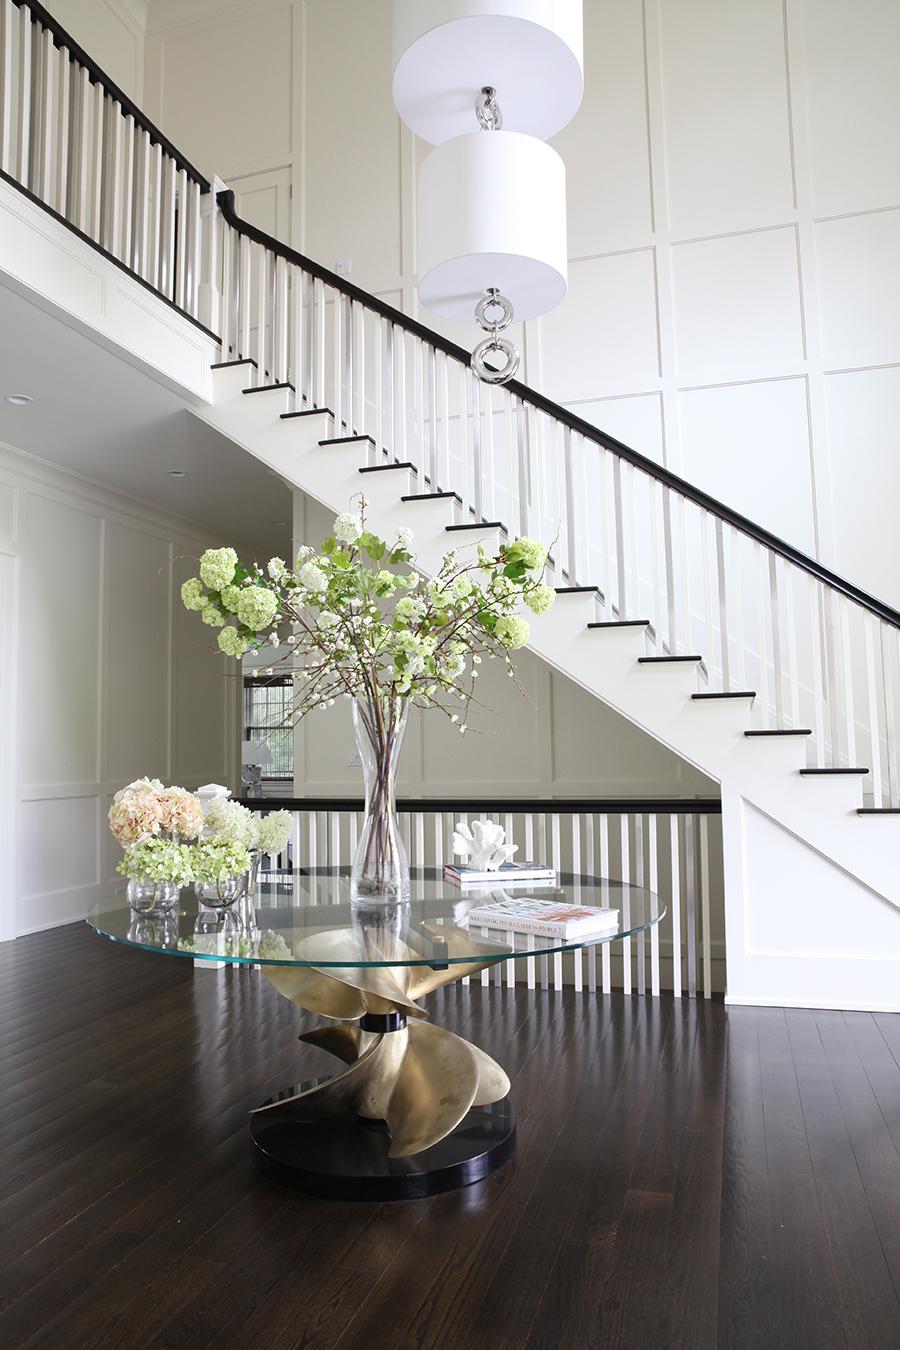 Hamptons_table_lamp_entry.jpg